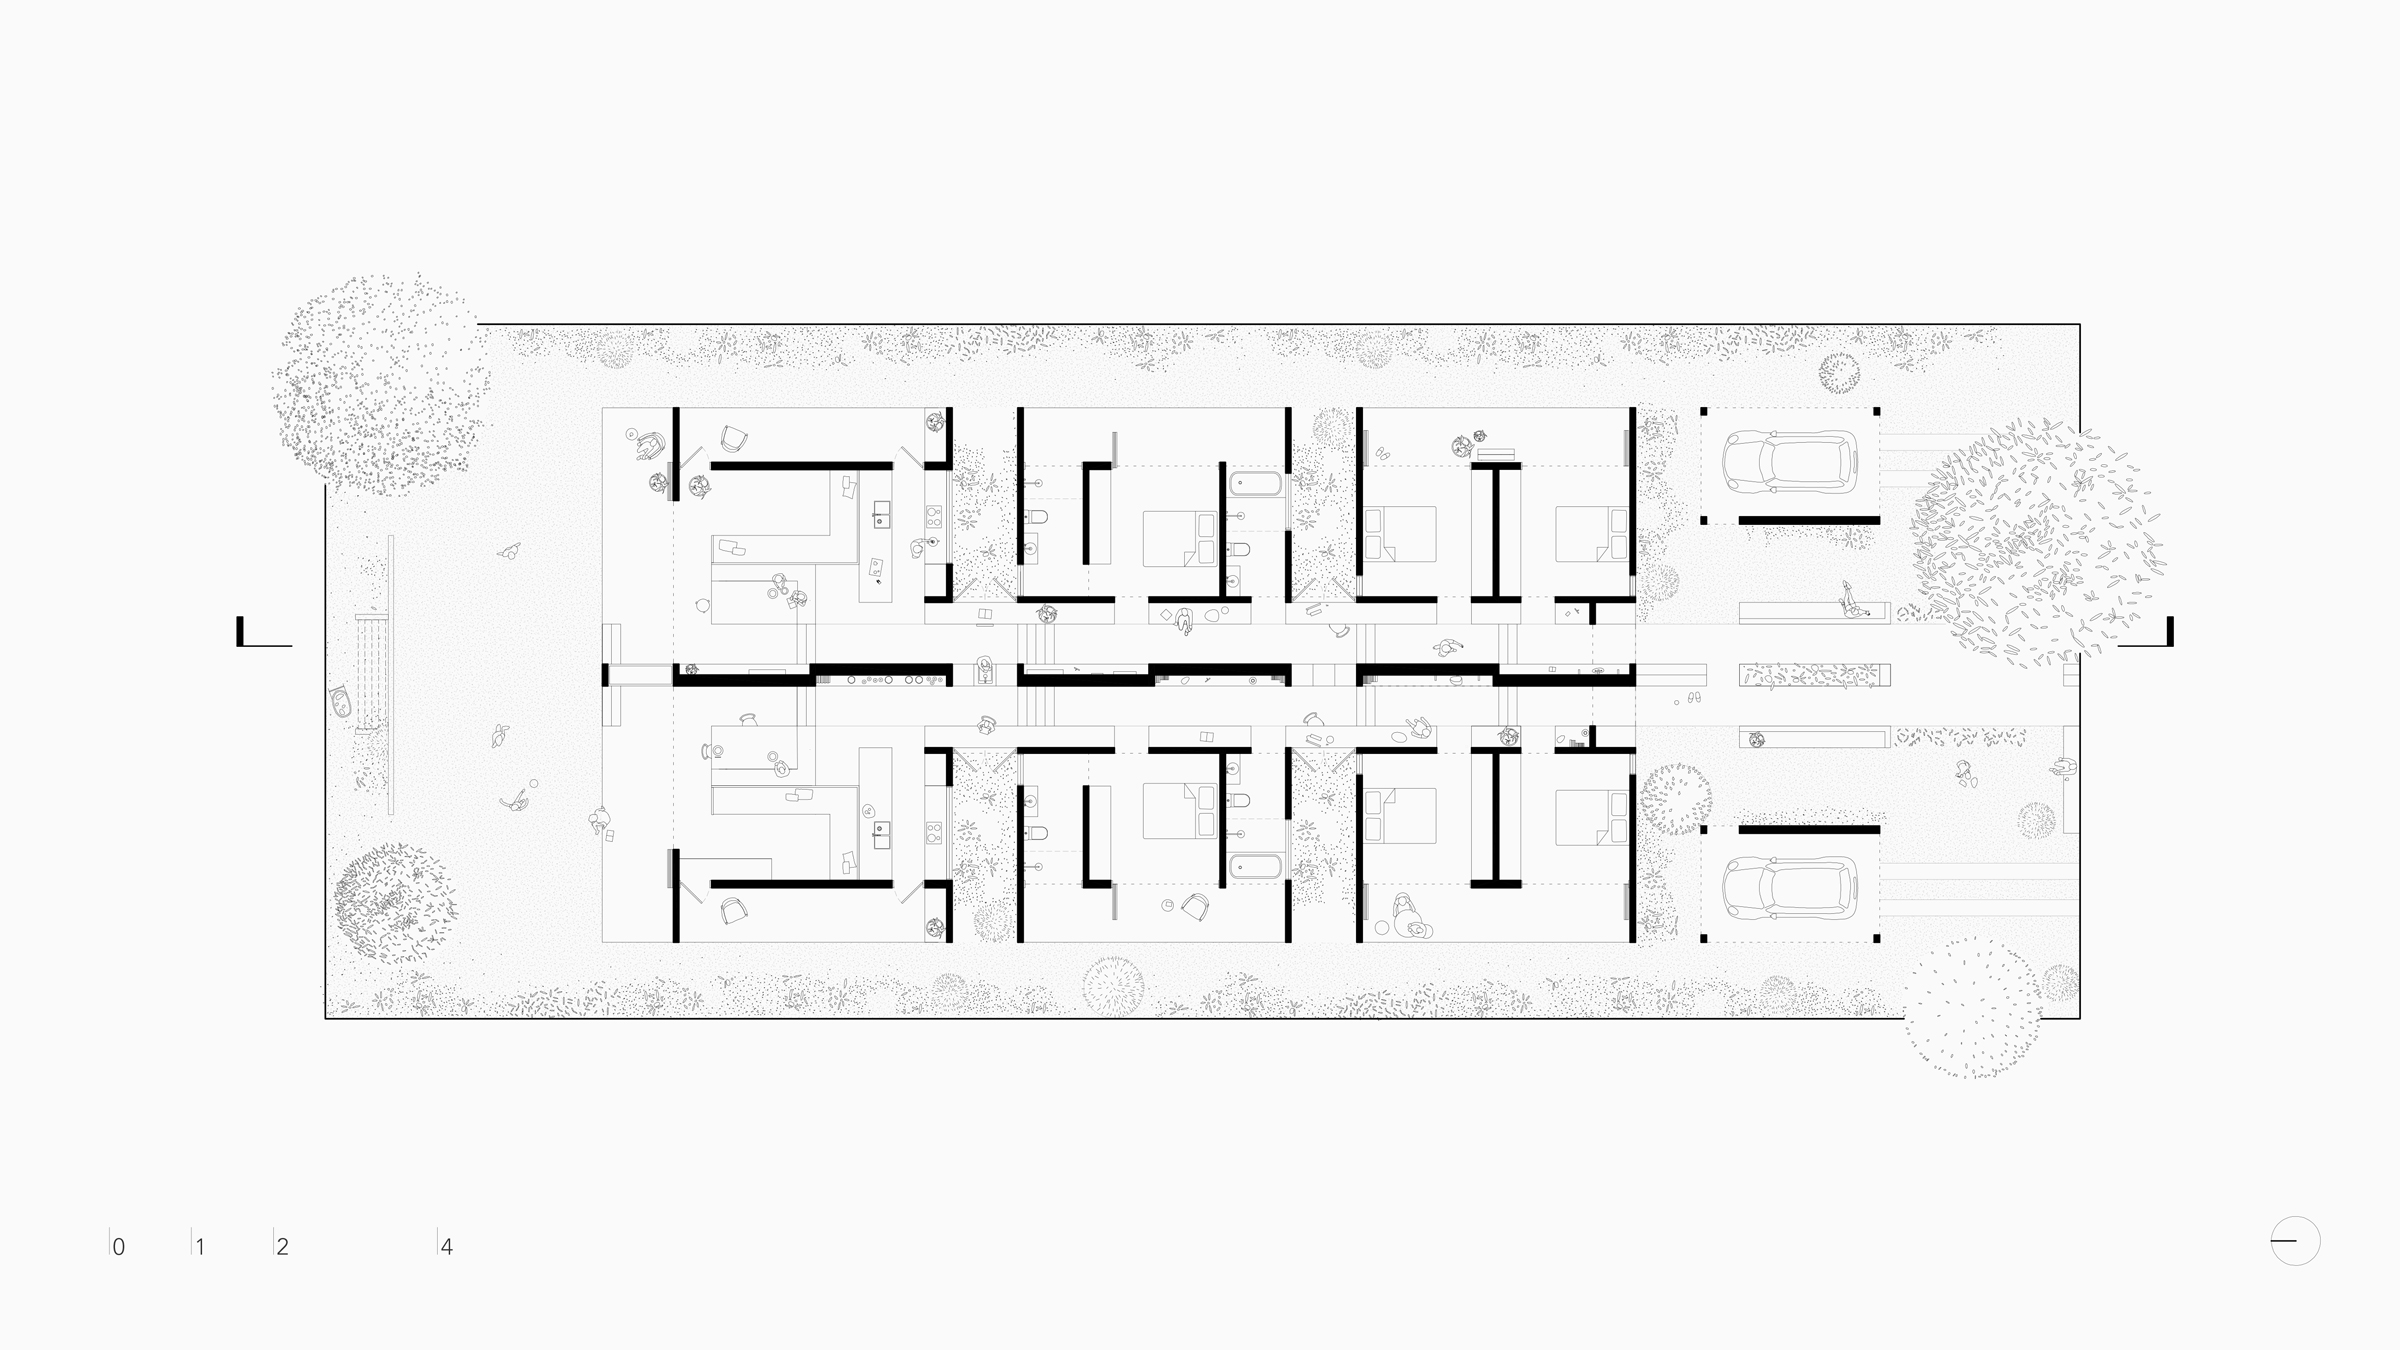 SYDNEY-RESIDENTIAL-ARCHITECT-TRIAS-STUDIO-HALF A HOUSE-PLAN